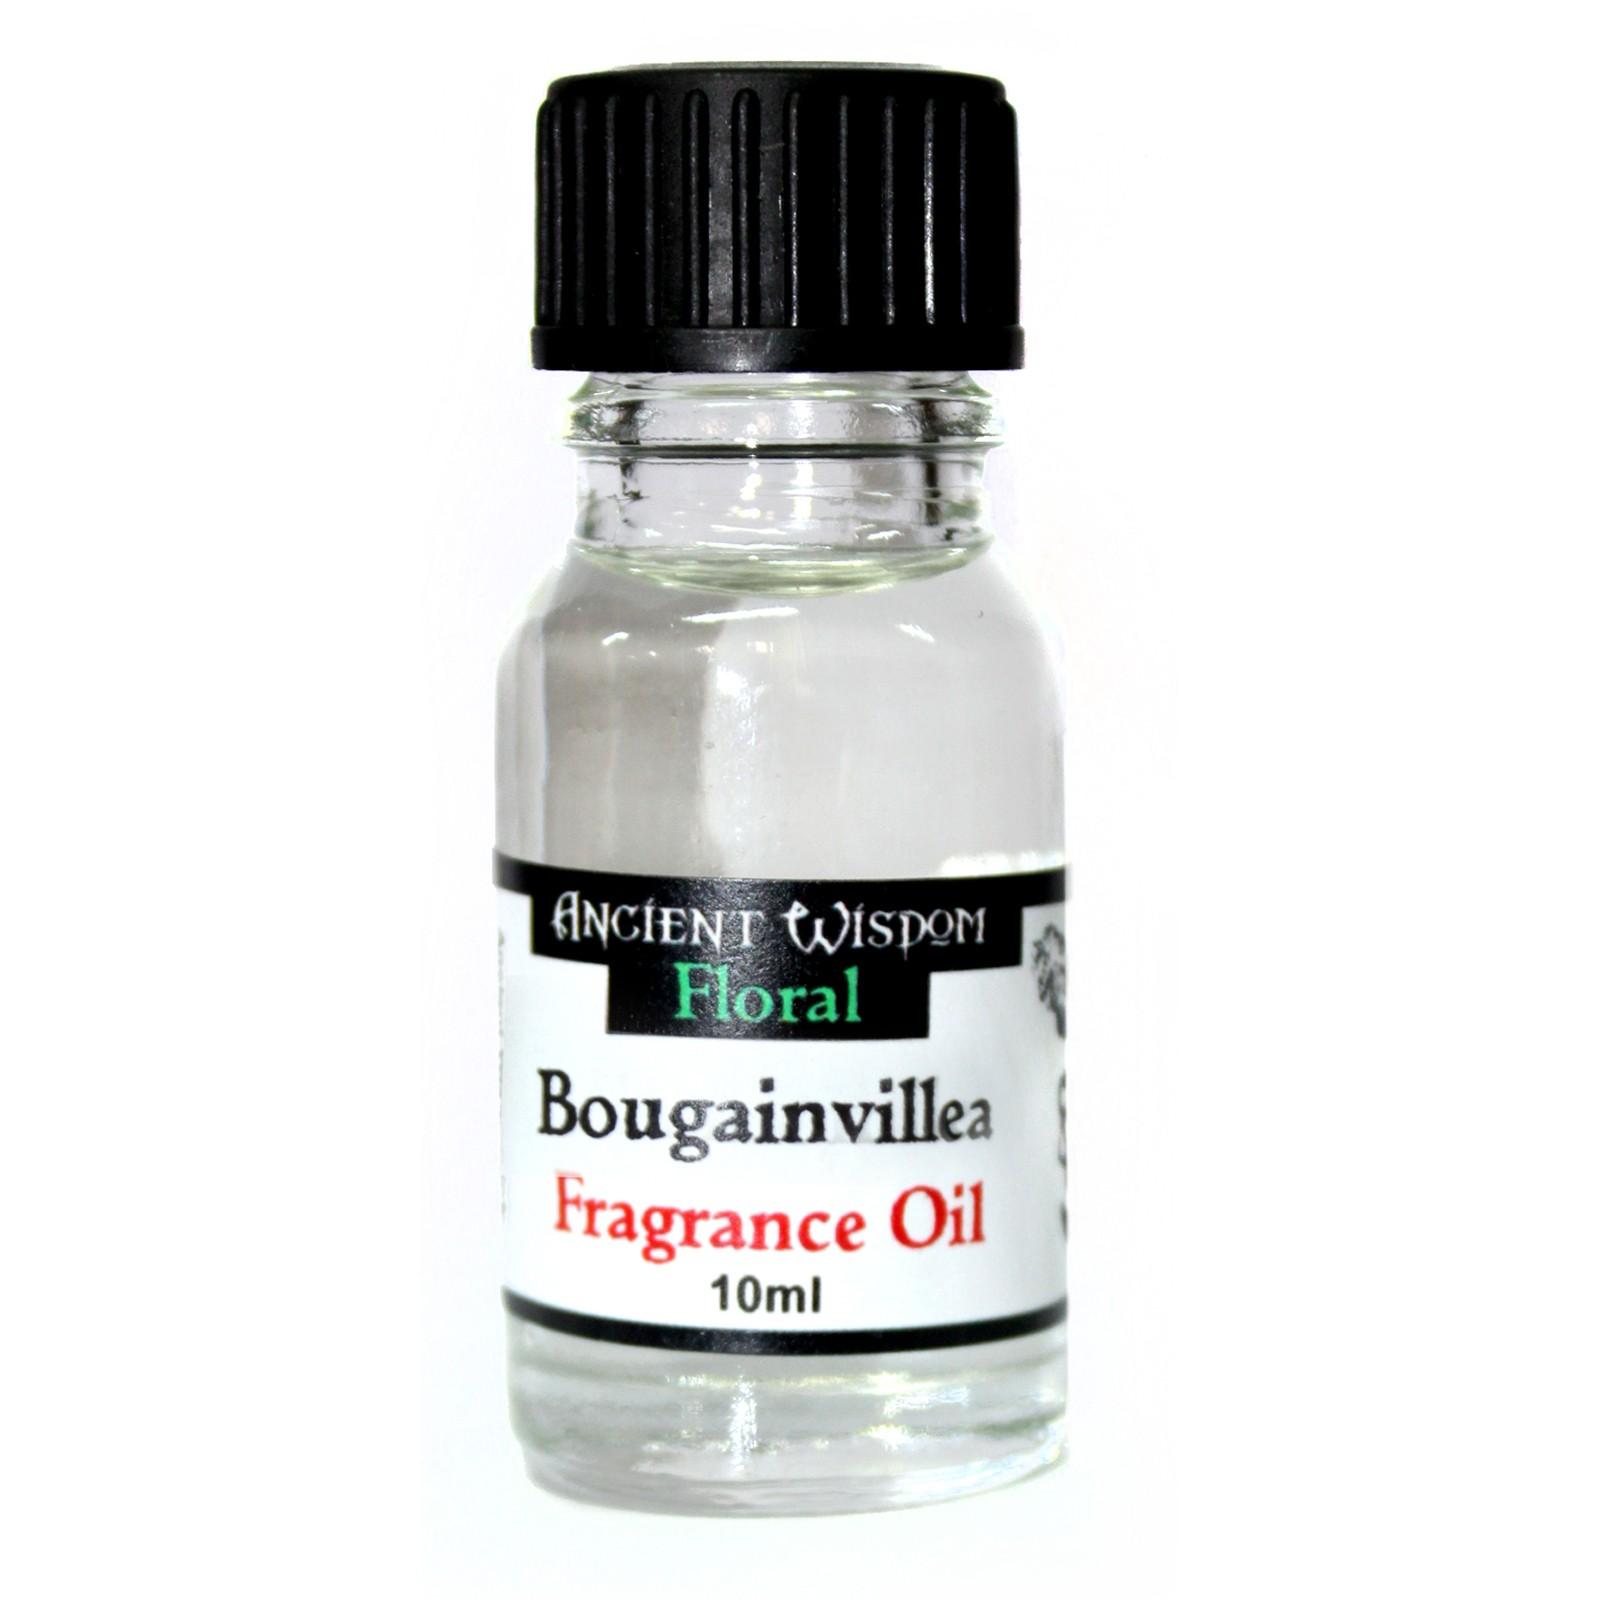 10ml Bougainvillea Fragrance Oil